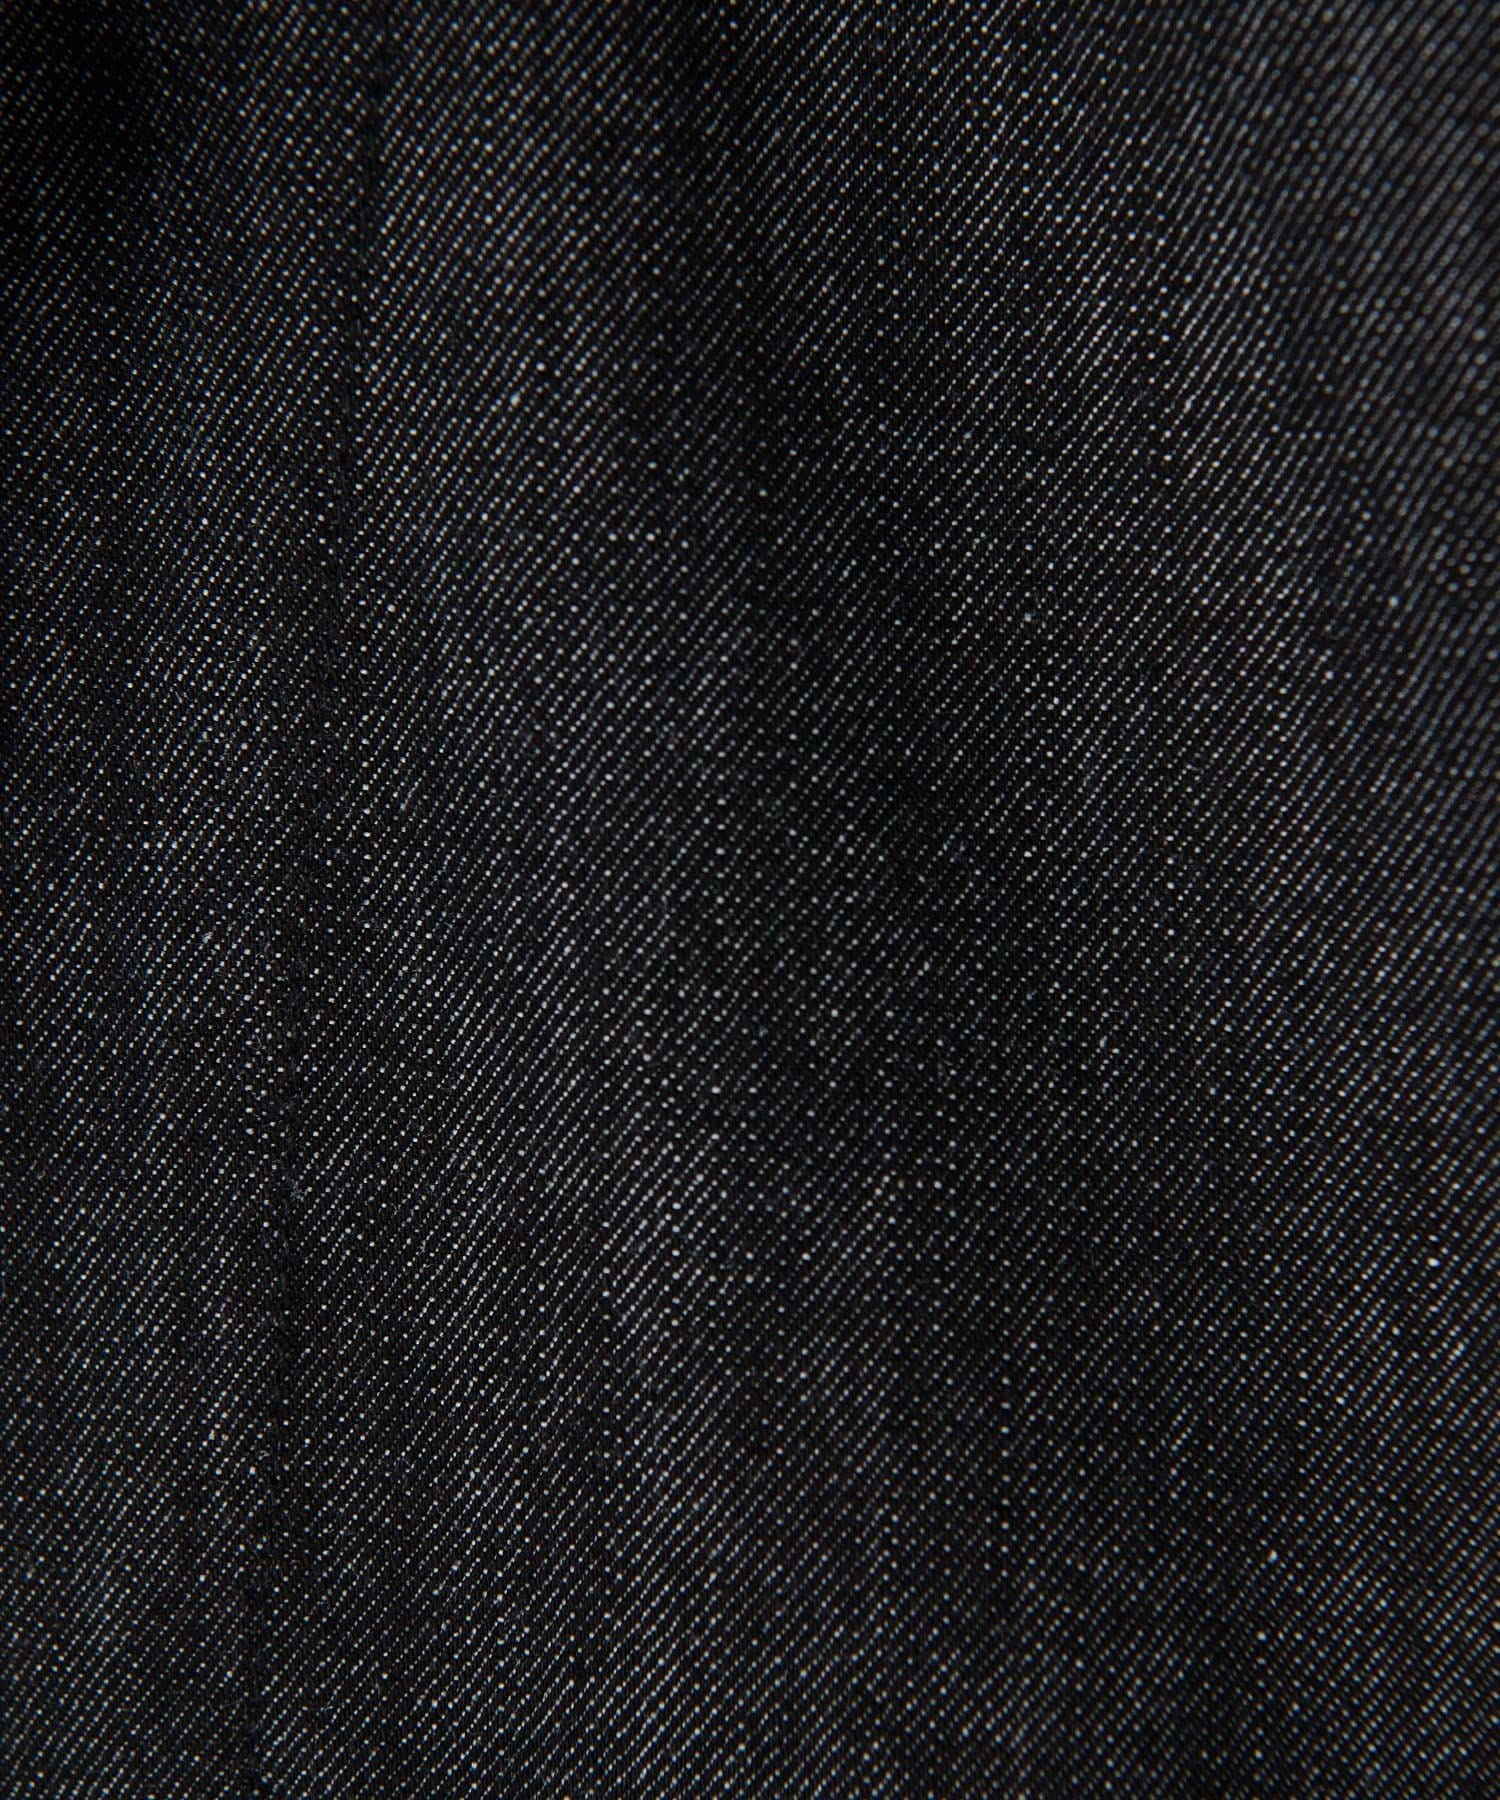 CIAOPANIC(チャオパニック) 【BIG MAC/ビッグマック】別注ビッグシルエットカバーオールシャツジャケット